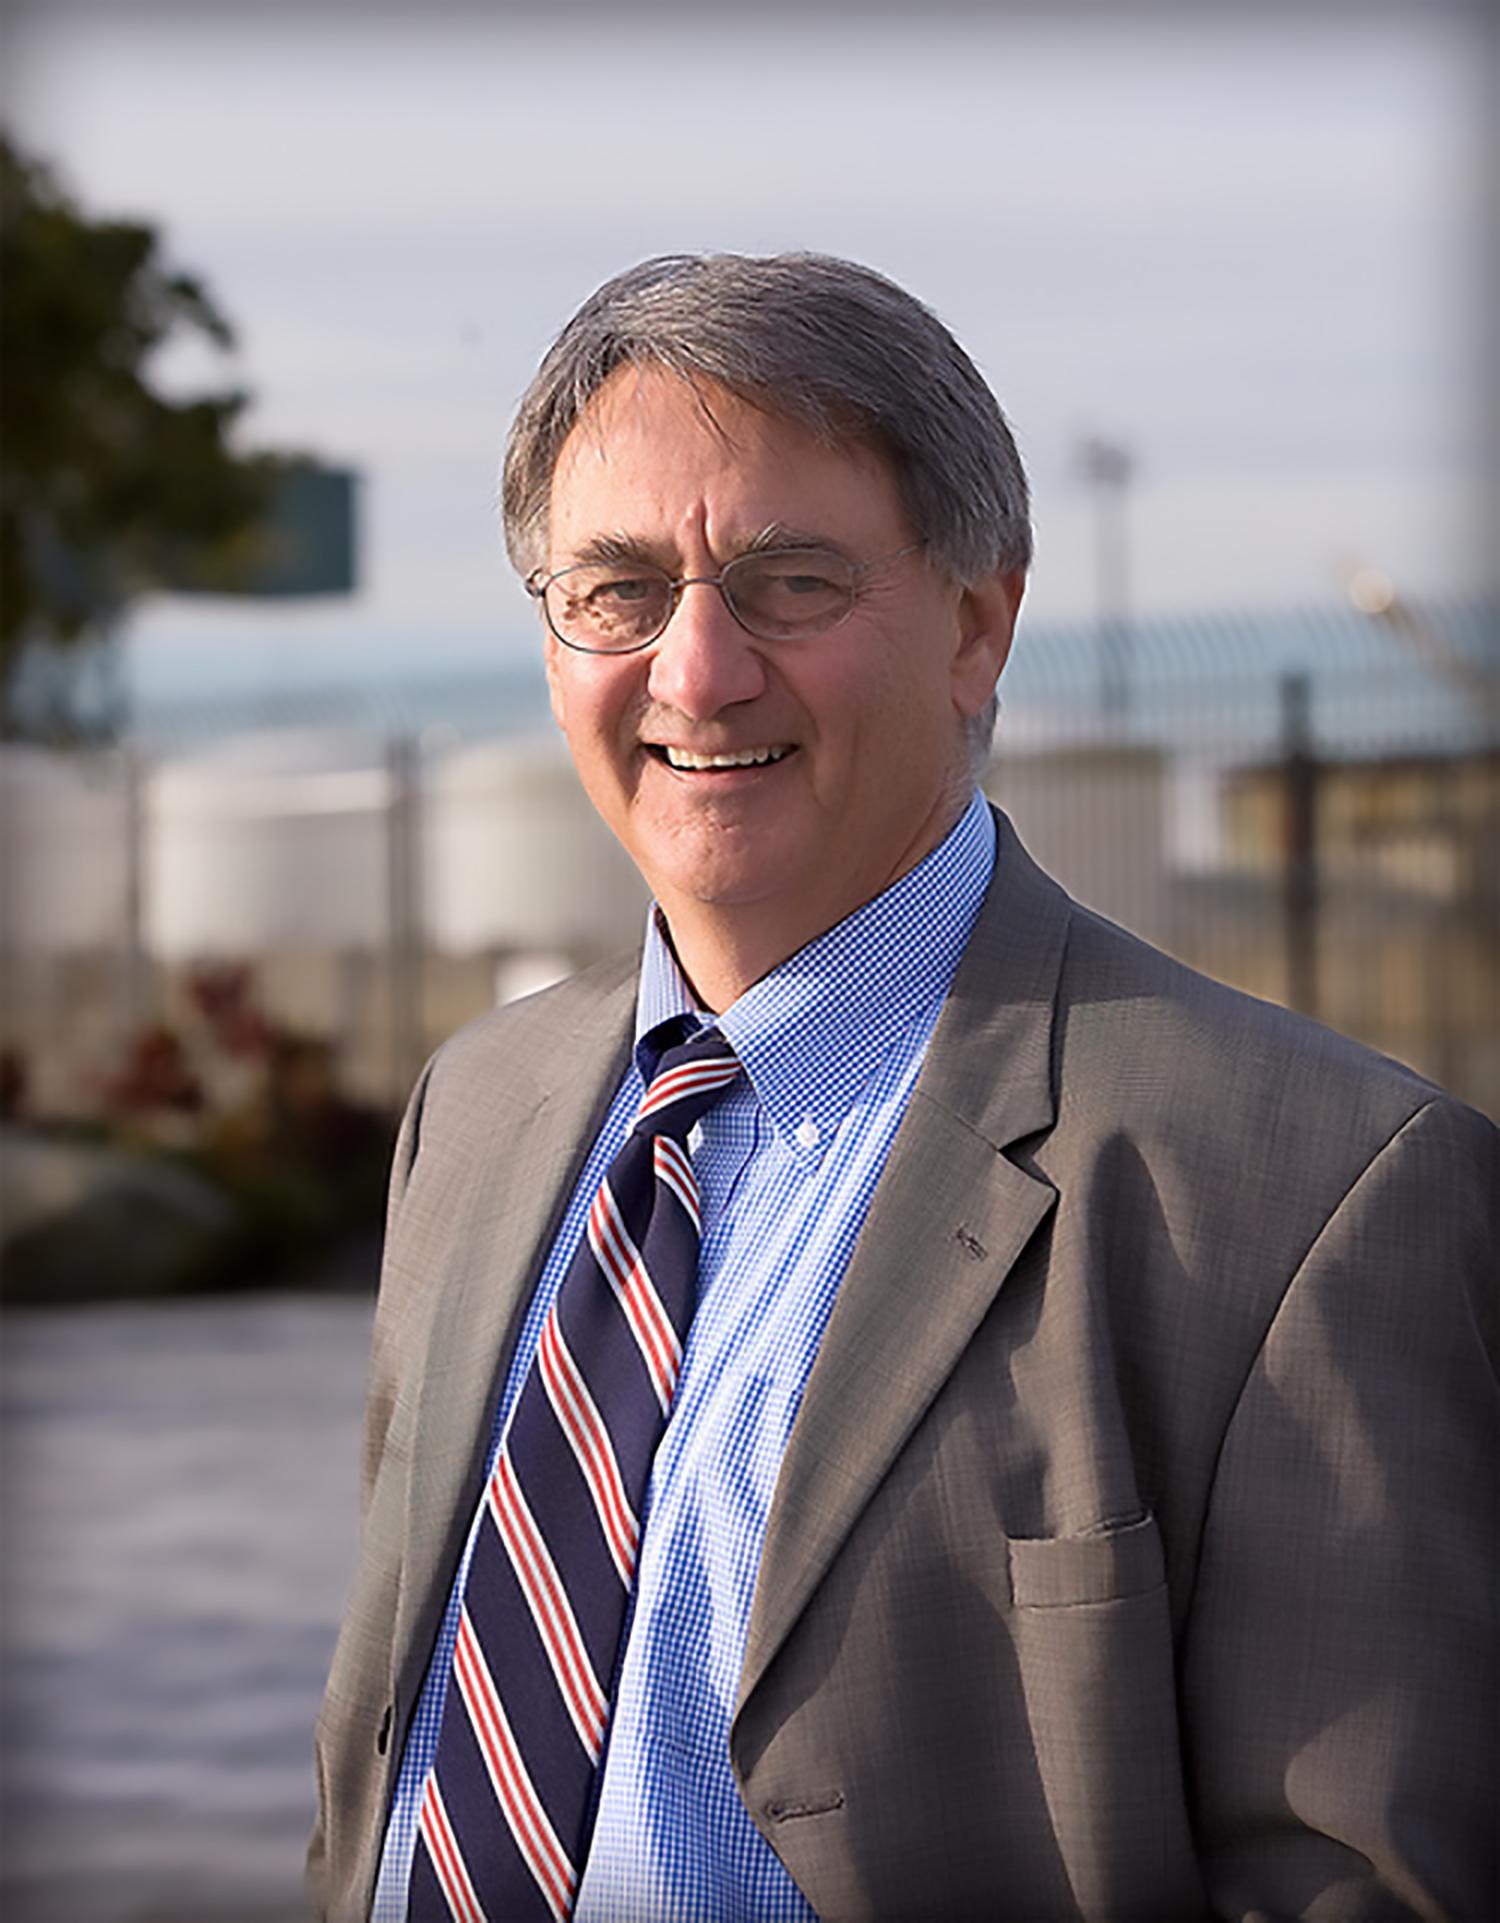 Keynote Speaker Cary Bozeman, Founder, The Bozeman Group,Former Mayor of Bremerton & Bellevue